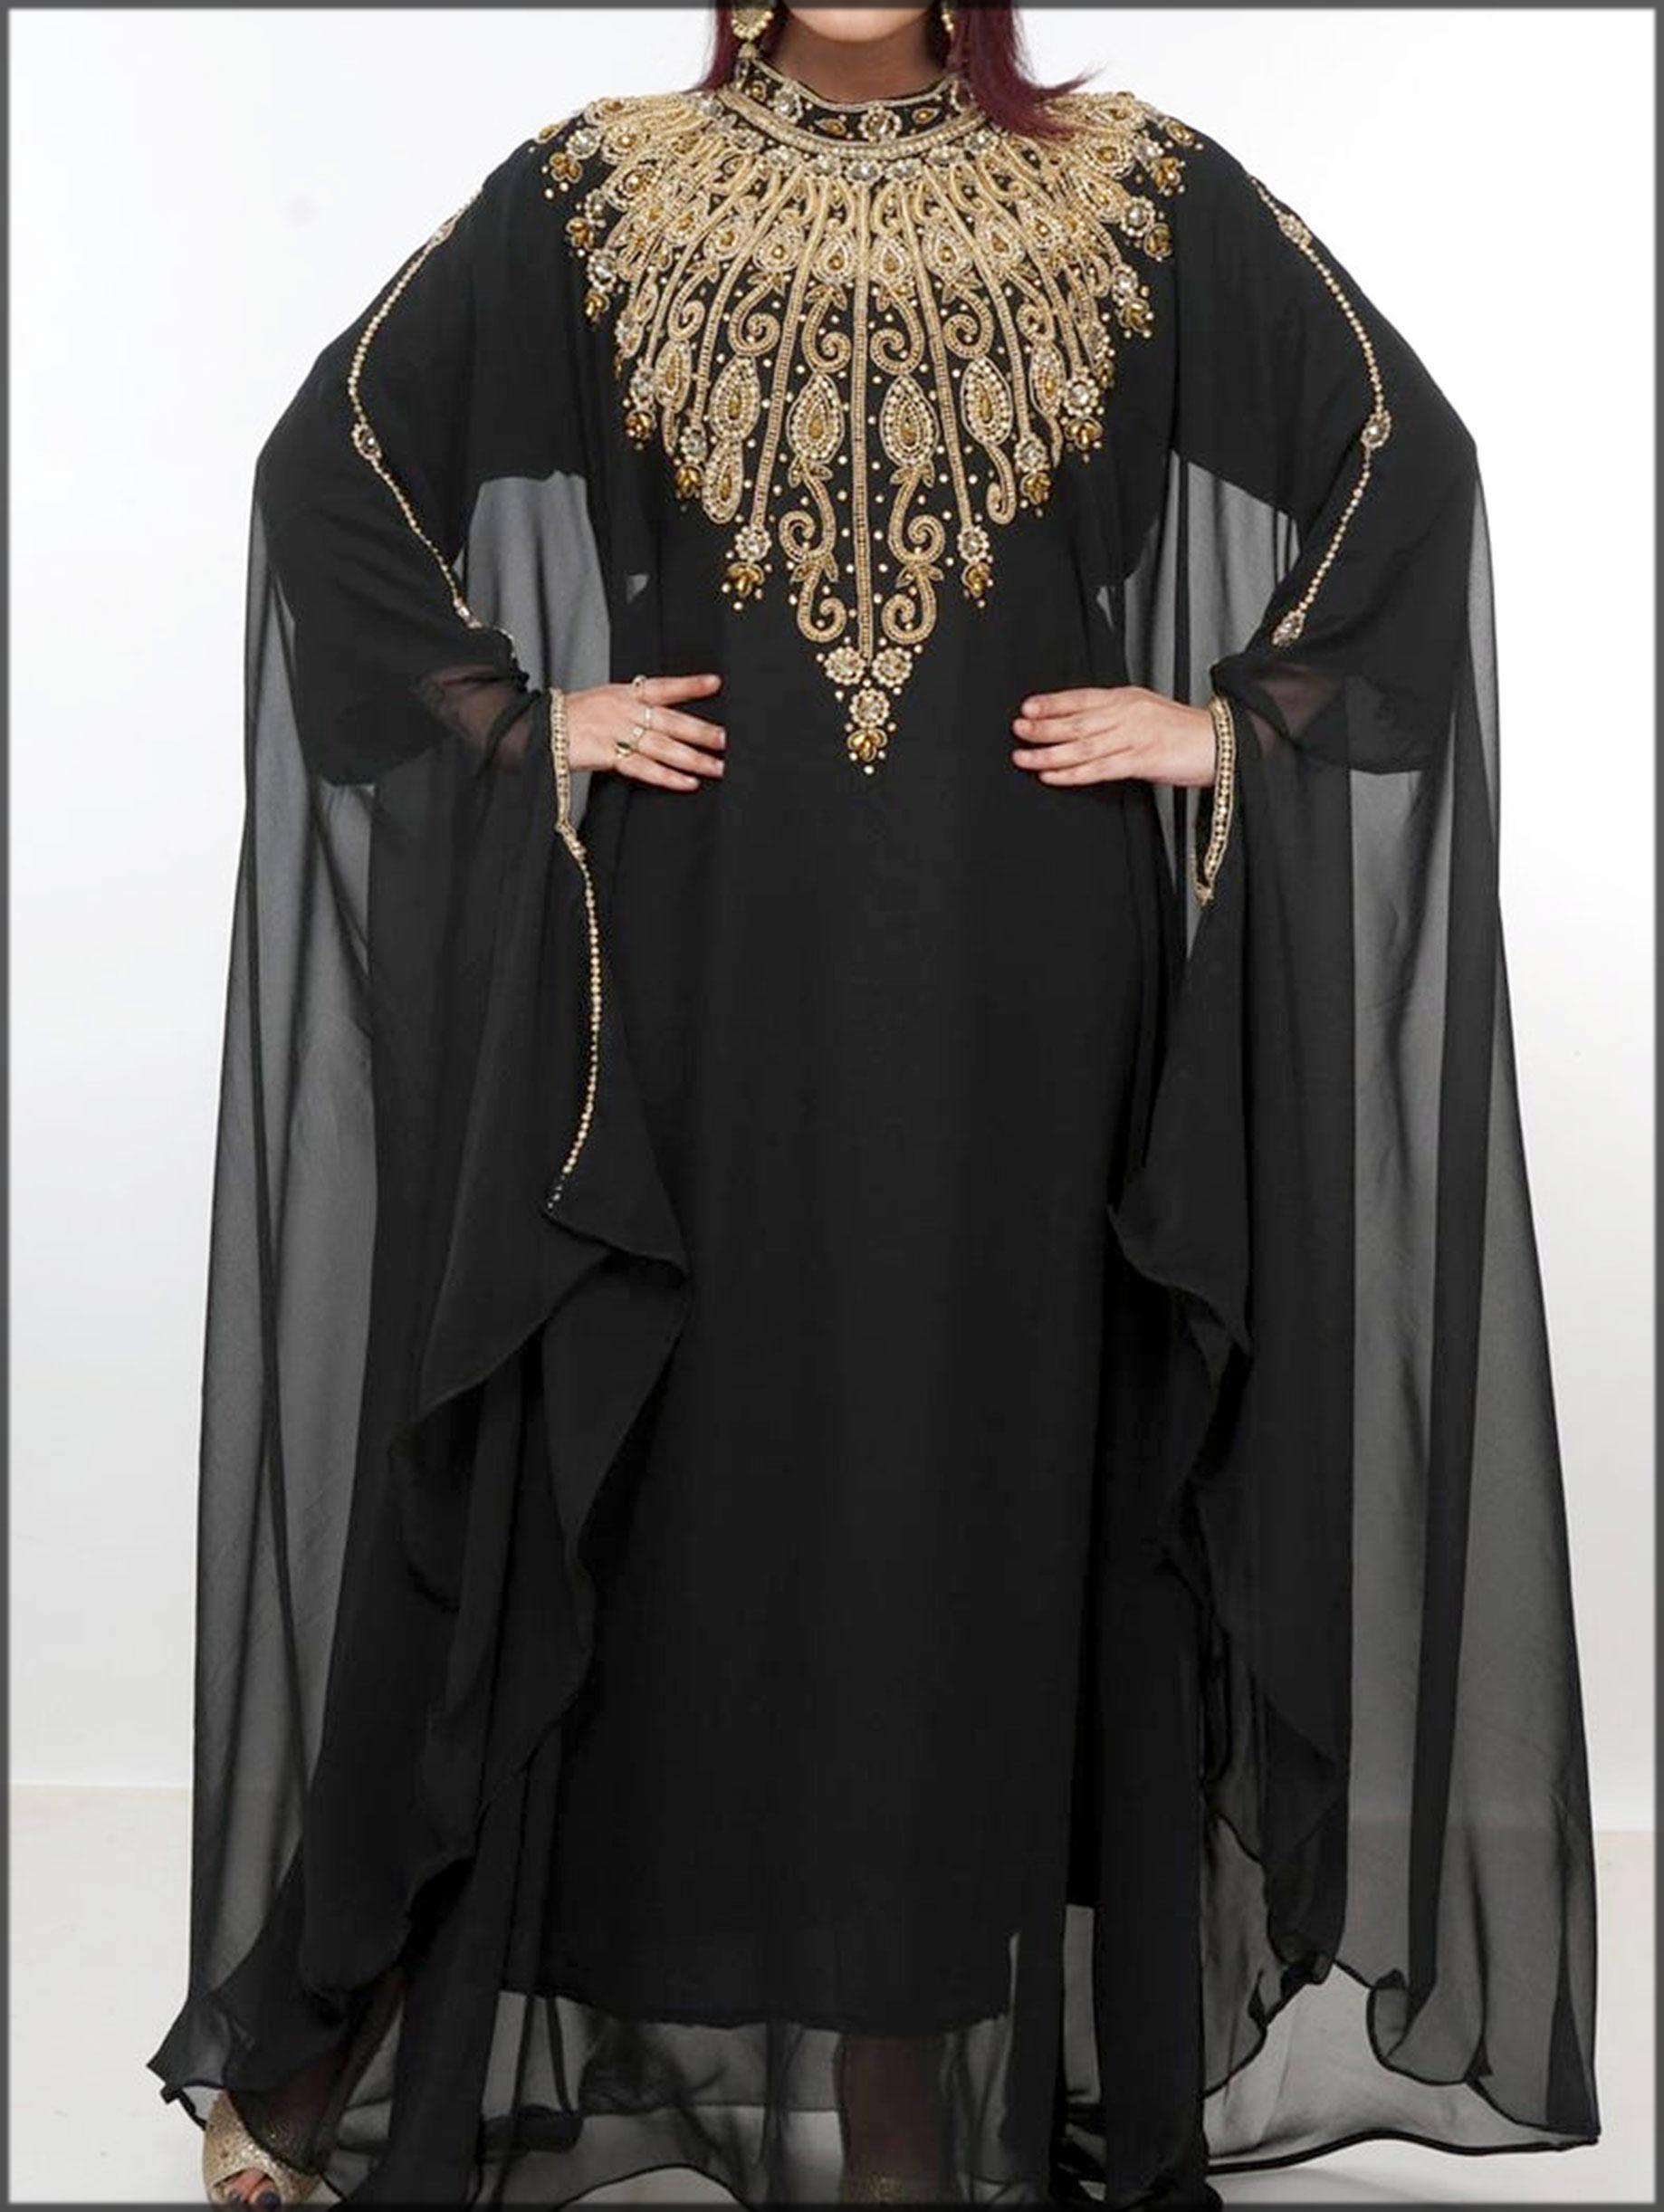 Black abaya dress with embroidery